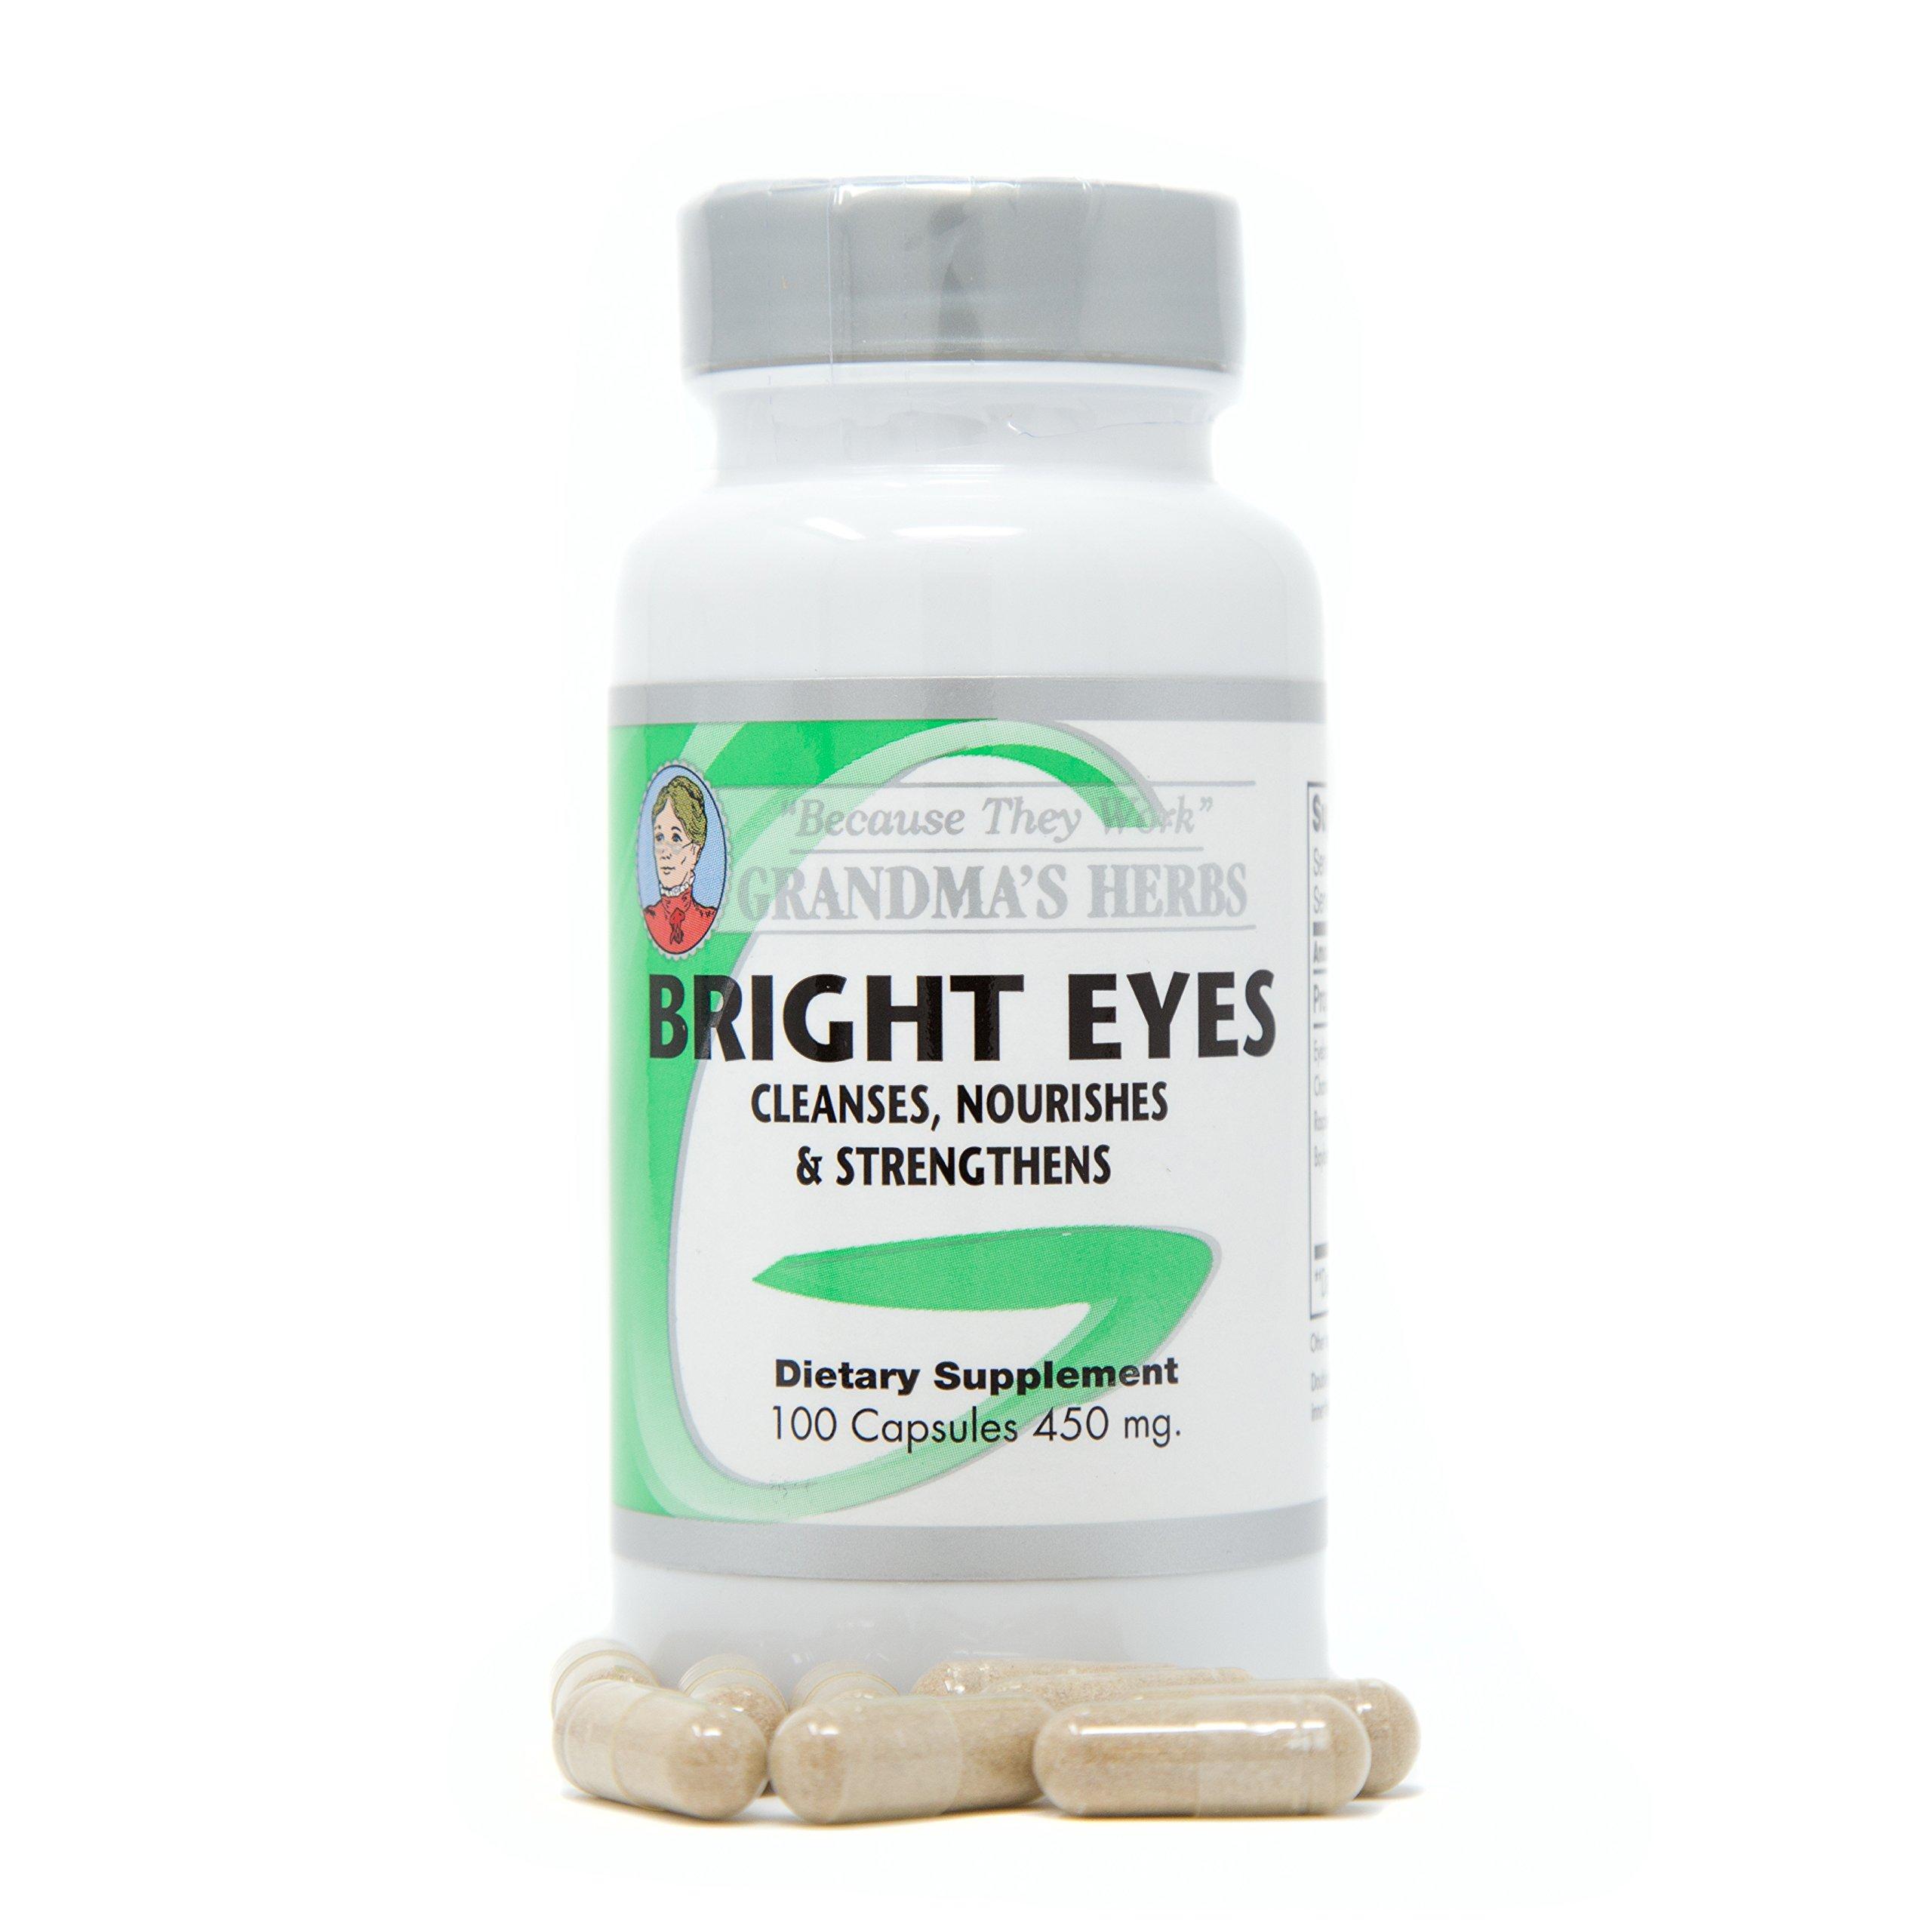 Bright Eyes - All Natural Vision Enhancer - 100 Capsules (1)